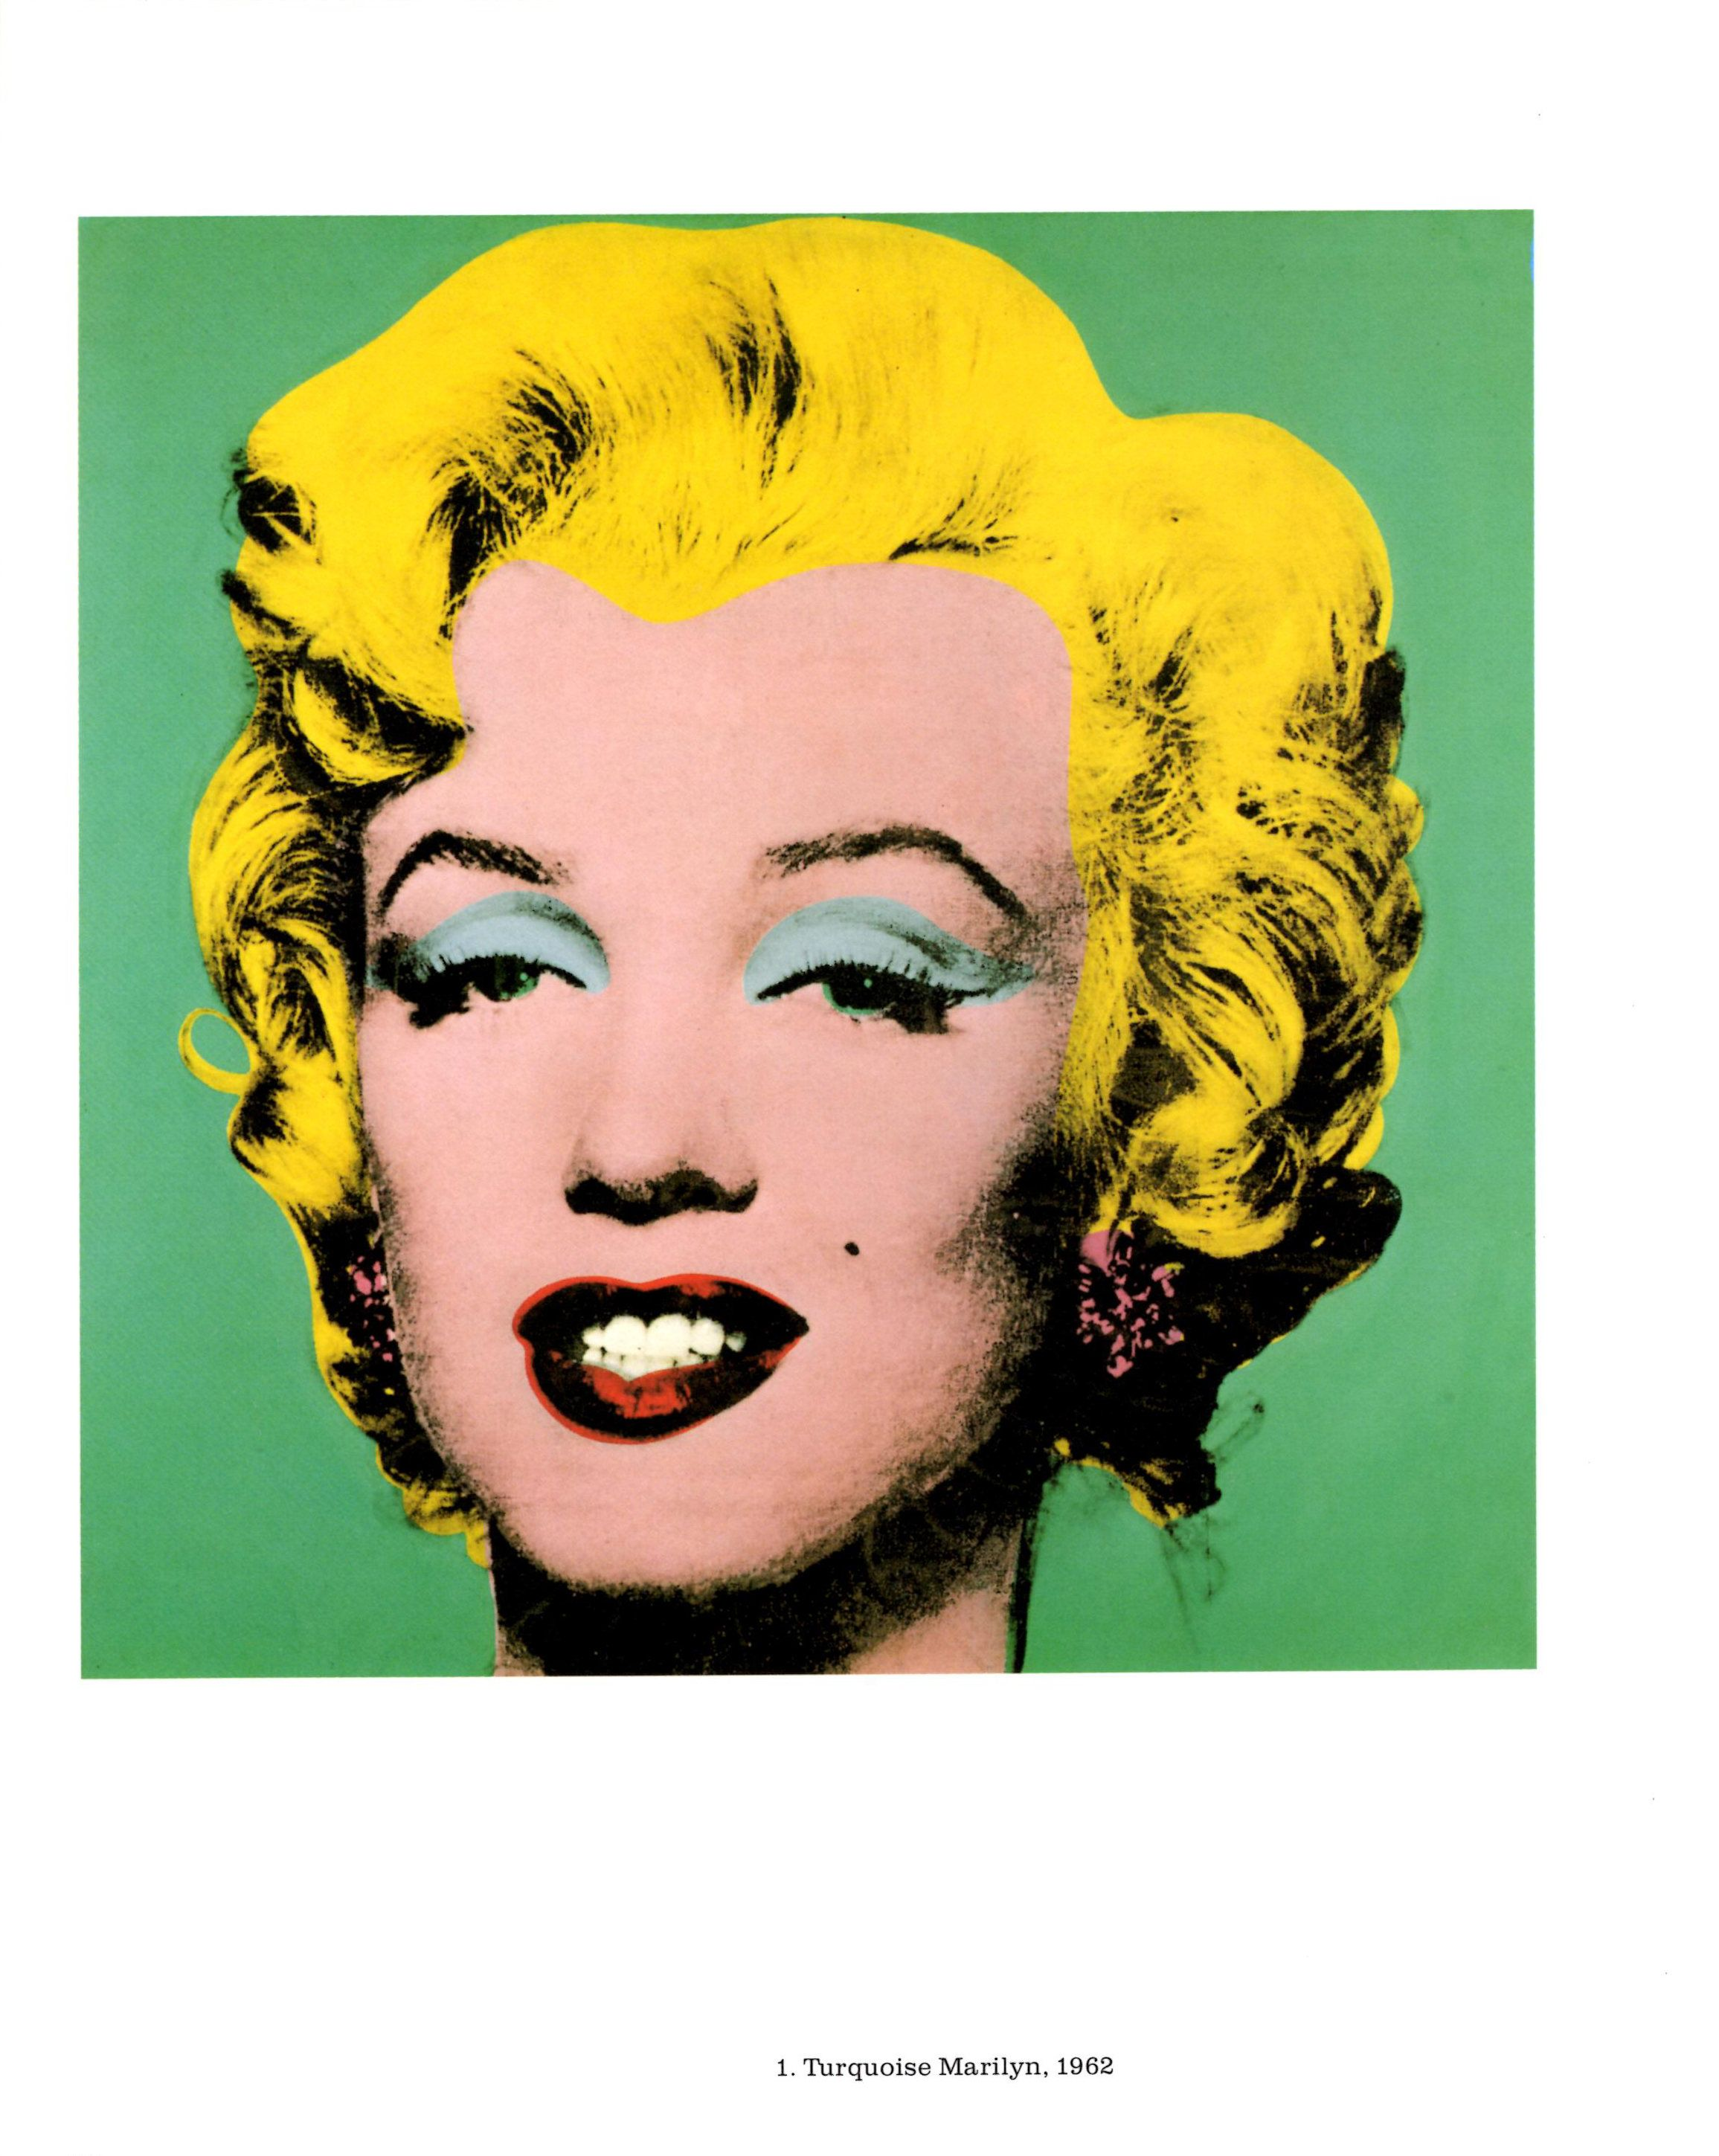 TURQUOISE MARILYN MONROE by Andy Warhol Vintage Pop Art Book | Etsy